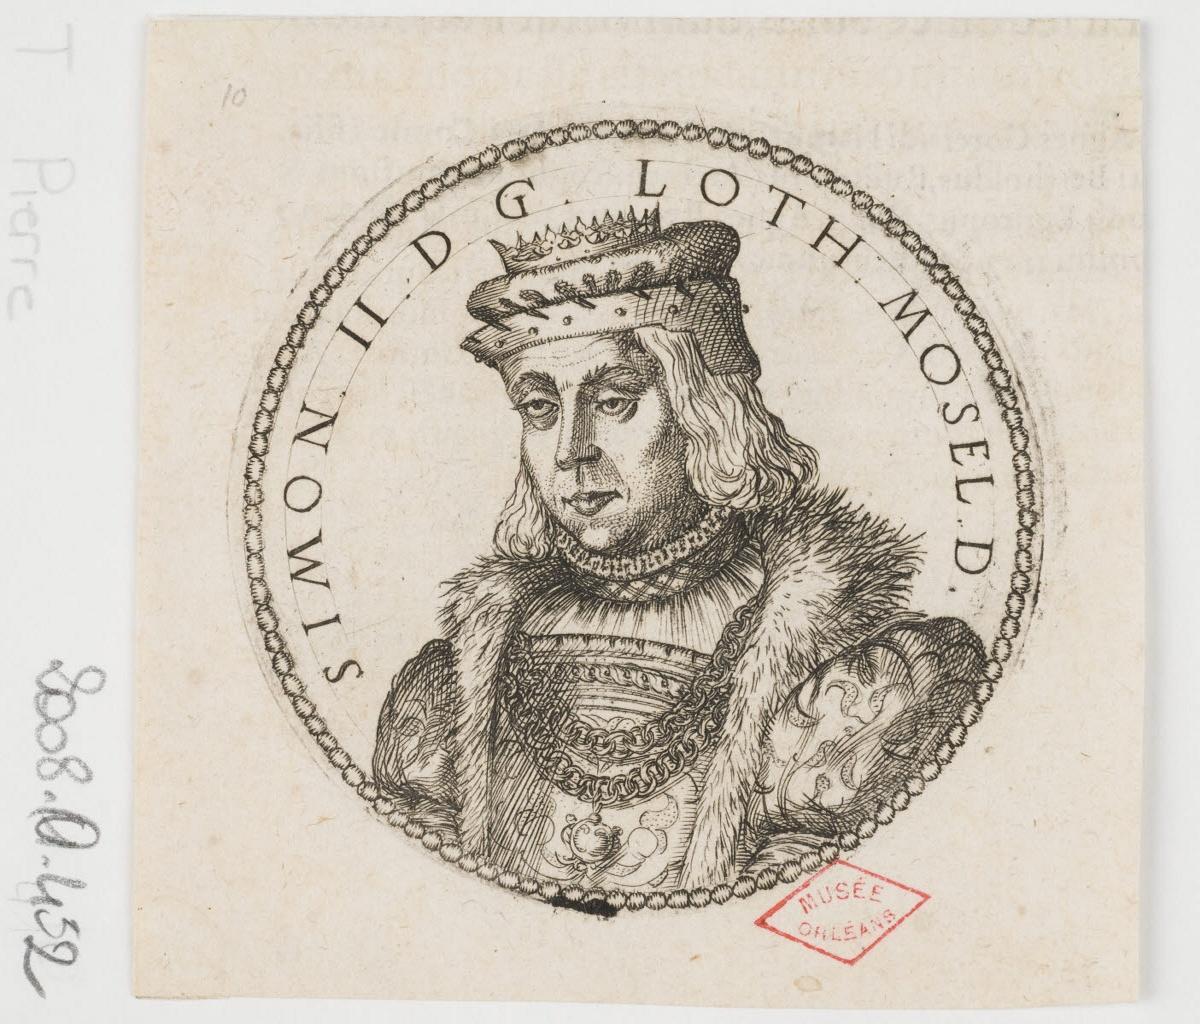 WOEIRIOT DE BOUZEY Pierre (graveur, inventeur) : Simon II, duc de Lorraine